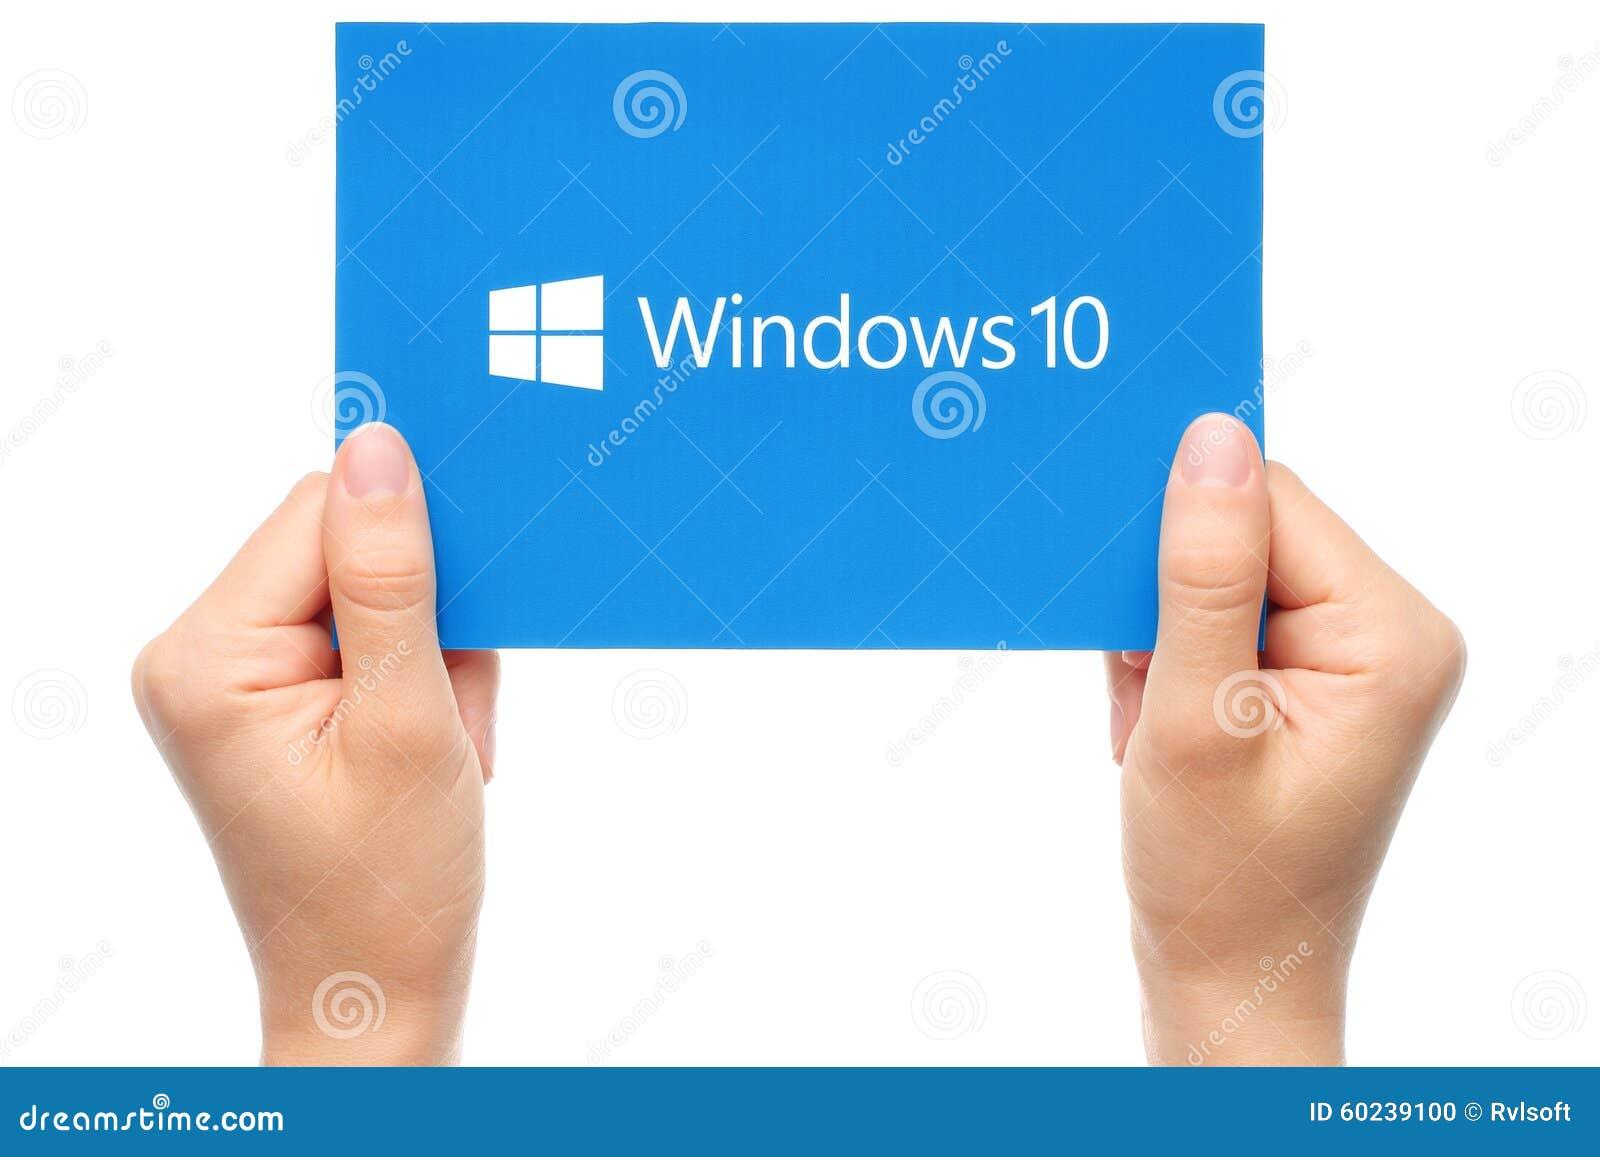 Hand holds Windows 10 logotype